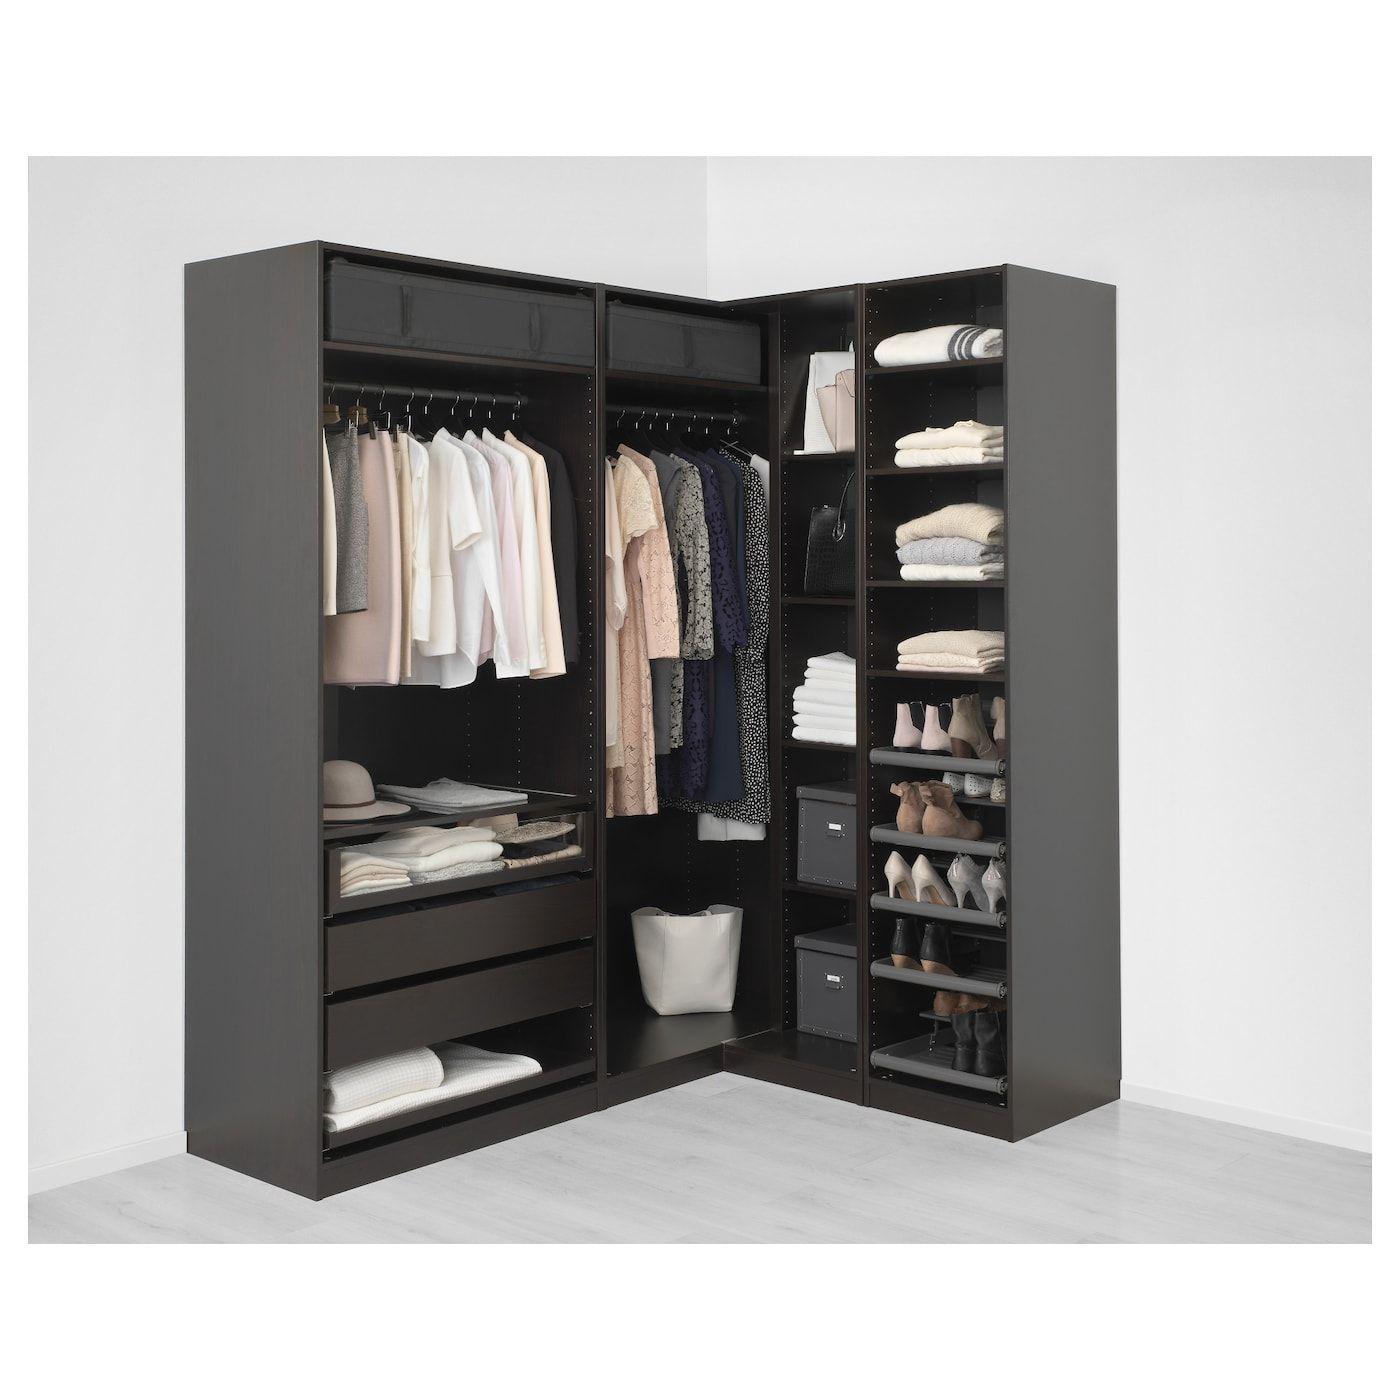 Pax Corner Wardrobe Black Brown Undredal Undredal Glass 82 3 4